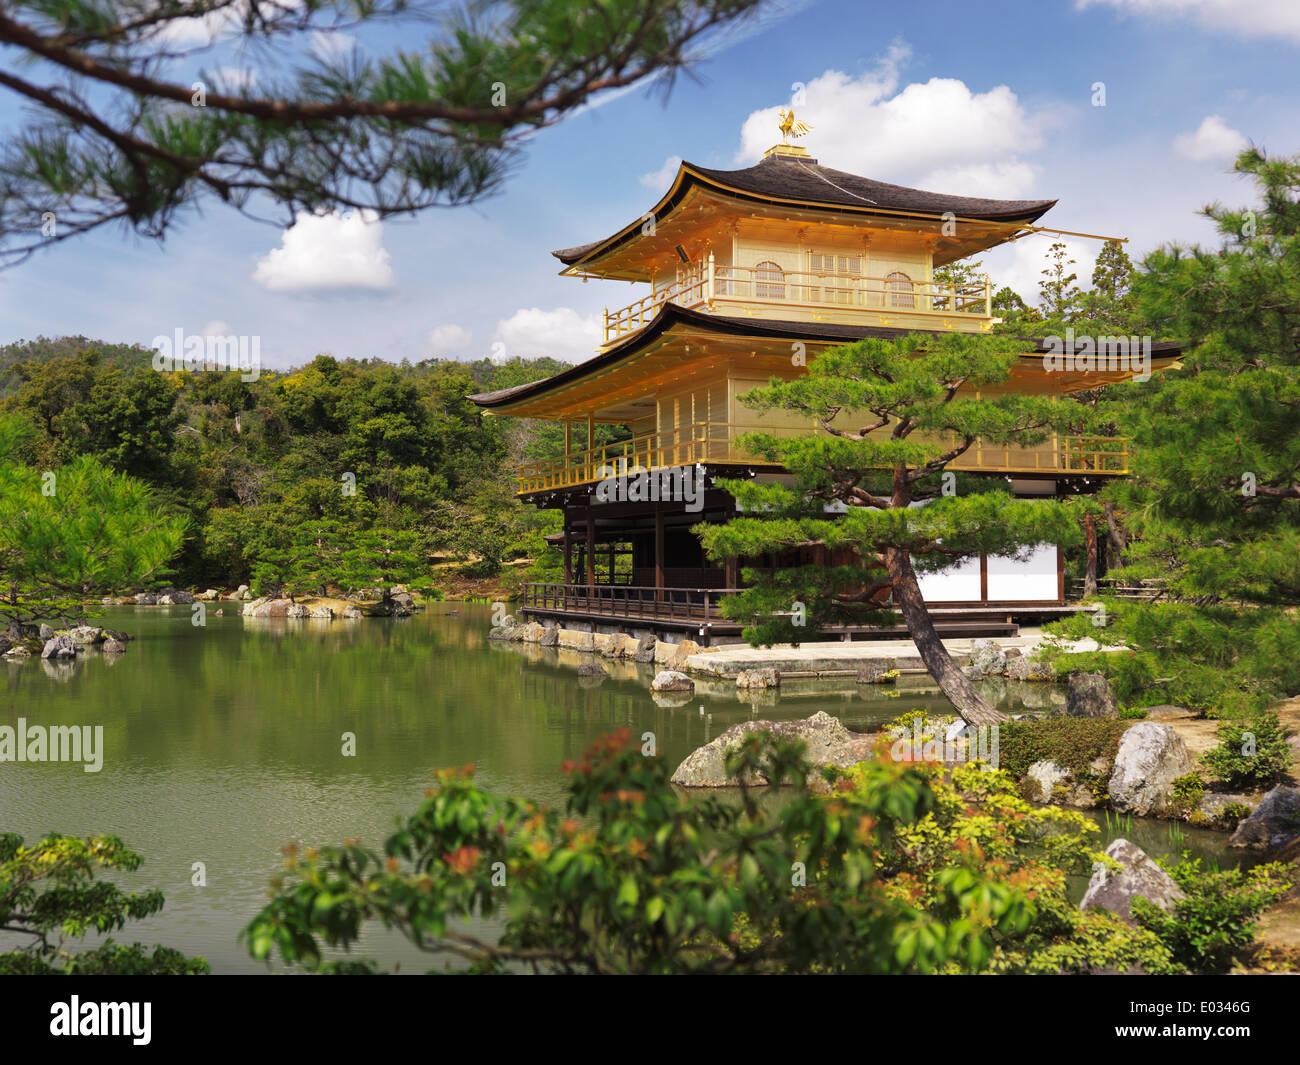 Kinkaku Ji Temple Of The Golden Pavilion Surrounded By Japanese